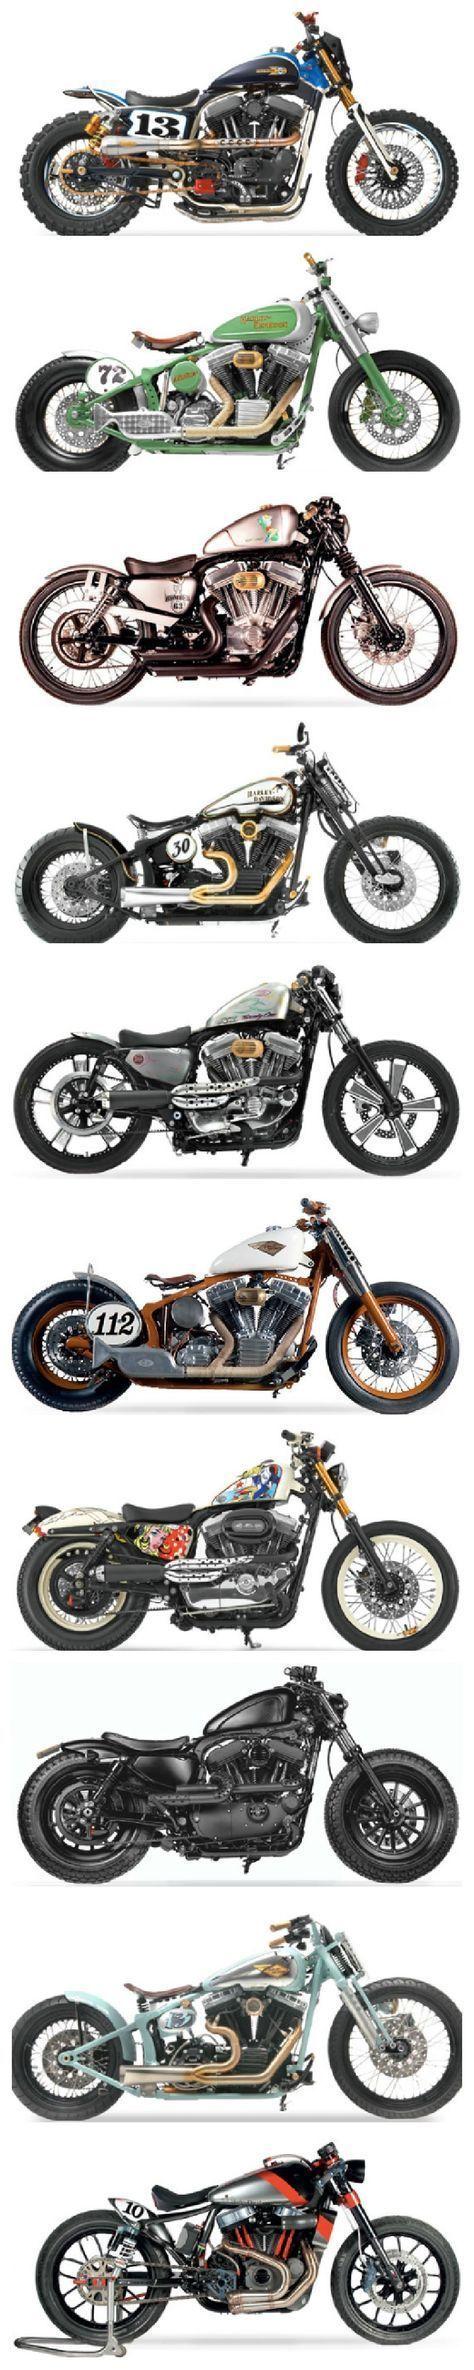 Road Legal Custom Harleys From Europe #harleydavidsonchopper #harleydavidsonchoppersbikes